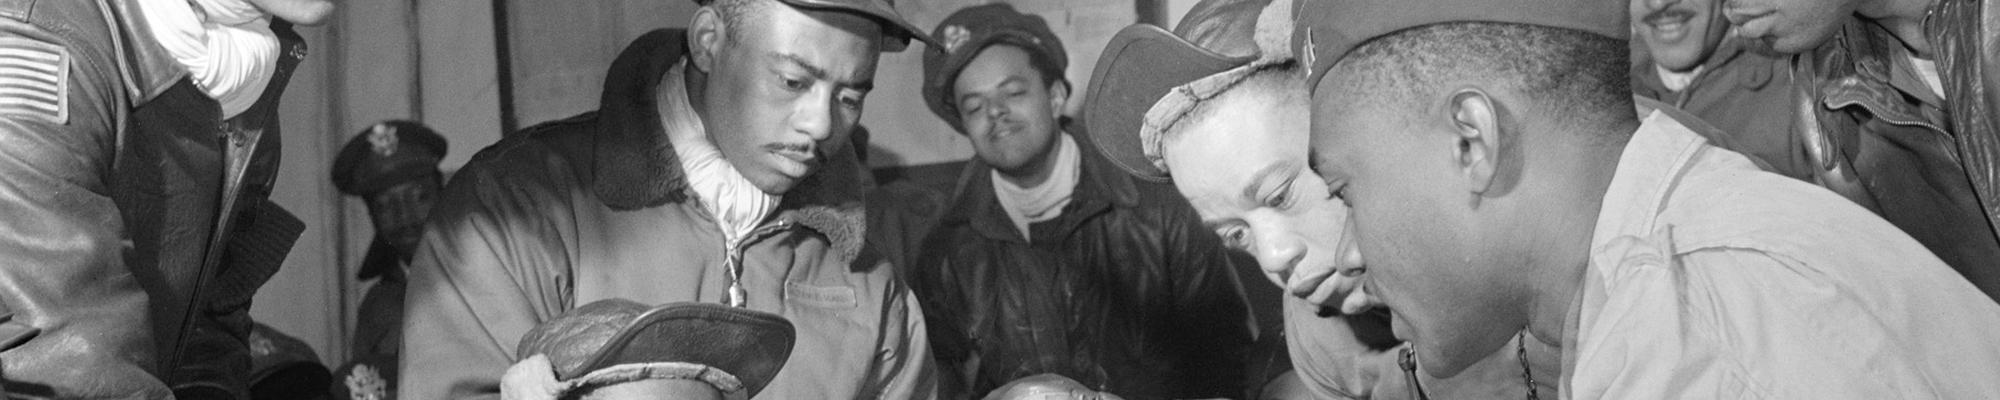 World War II African American service members